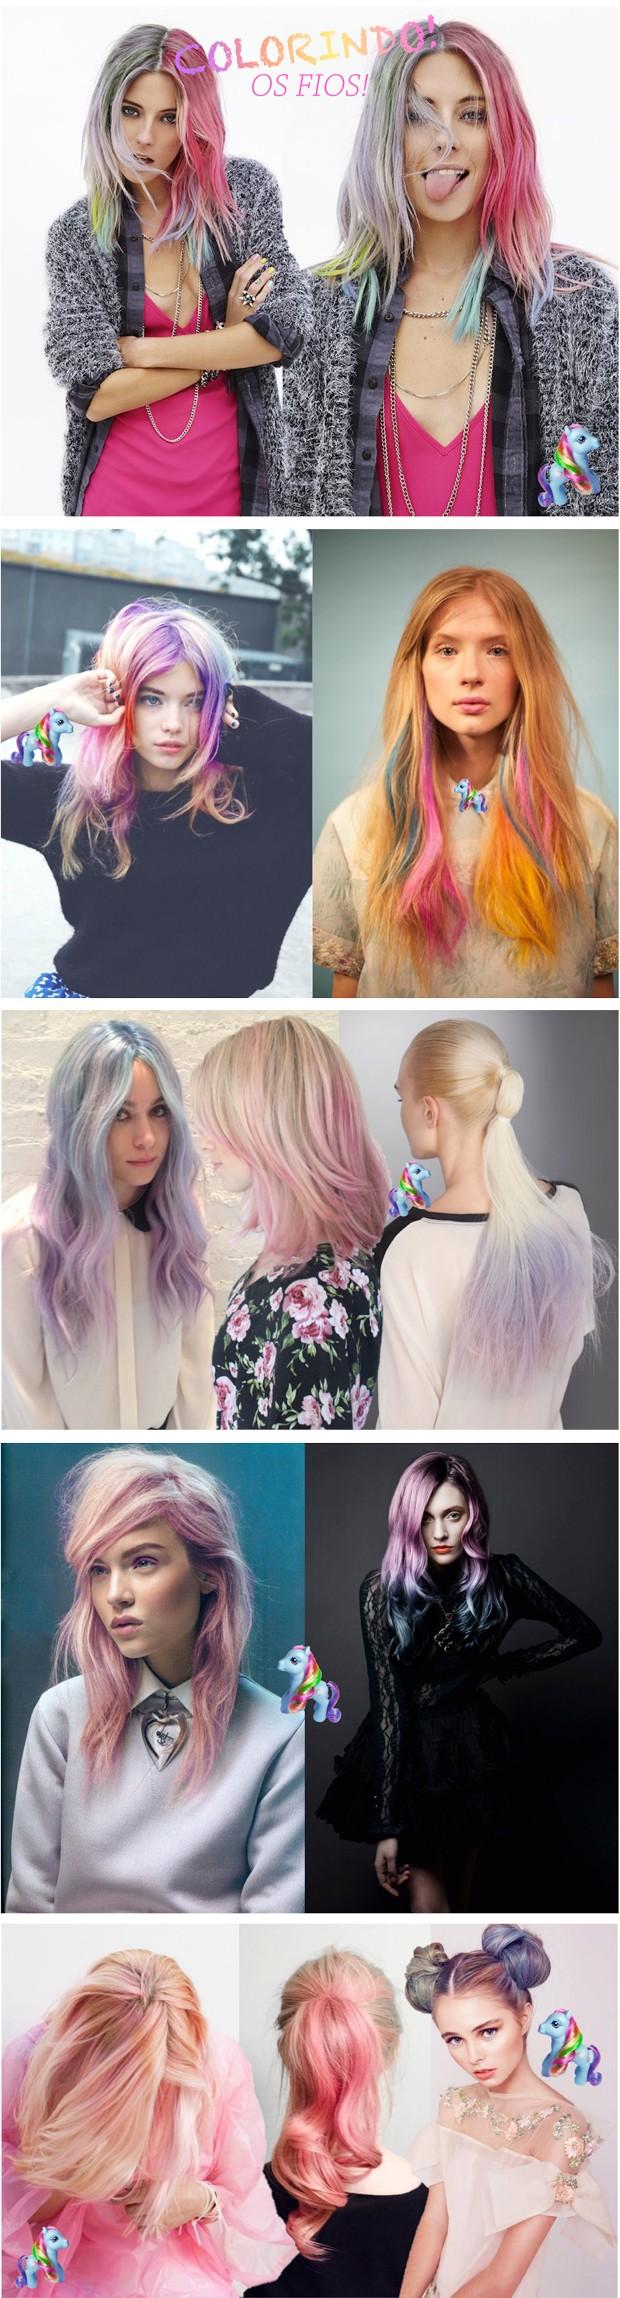 unicorn-hair-d